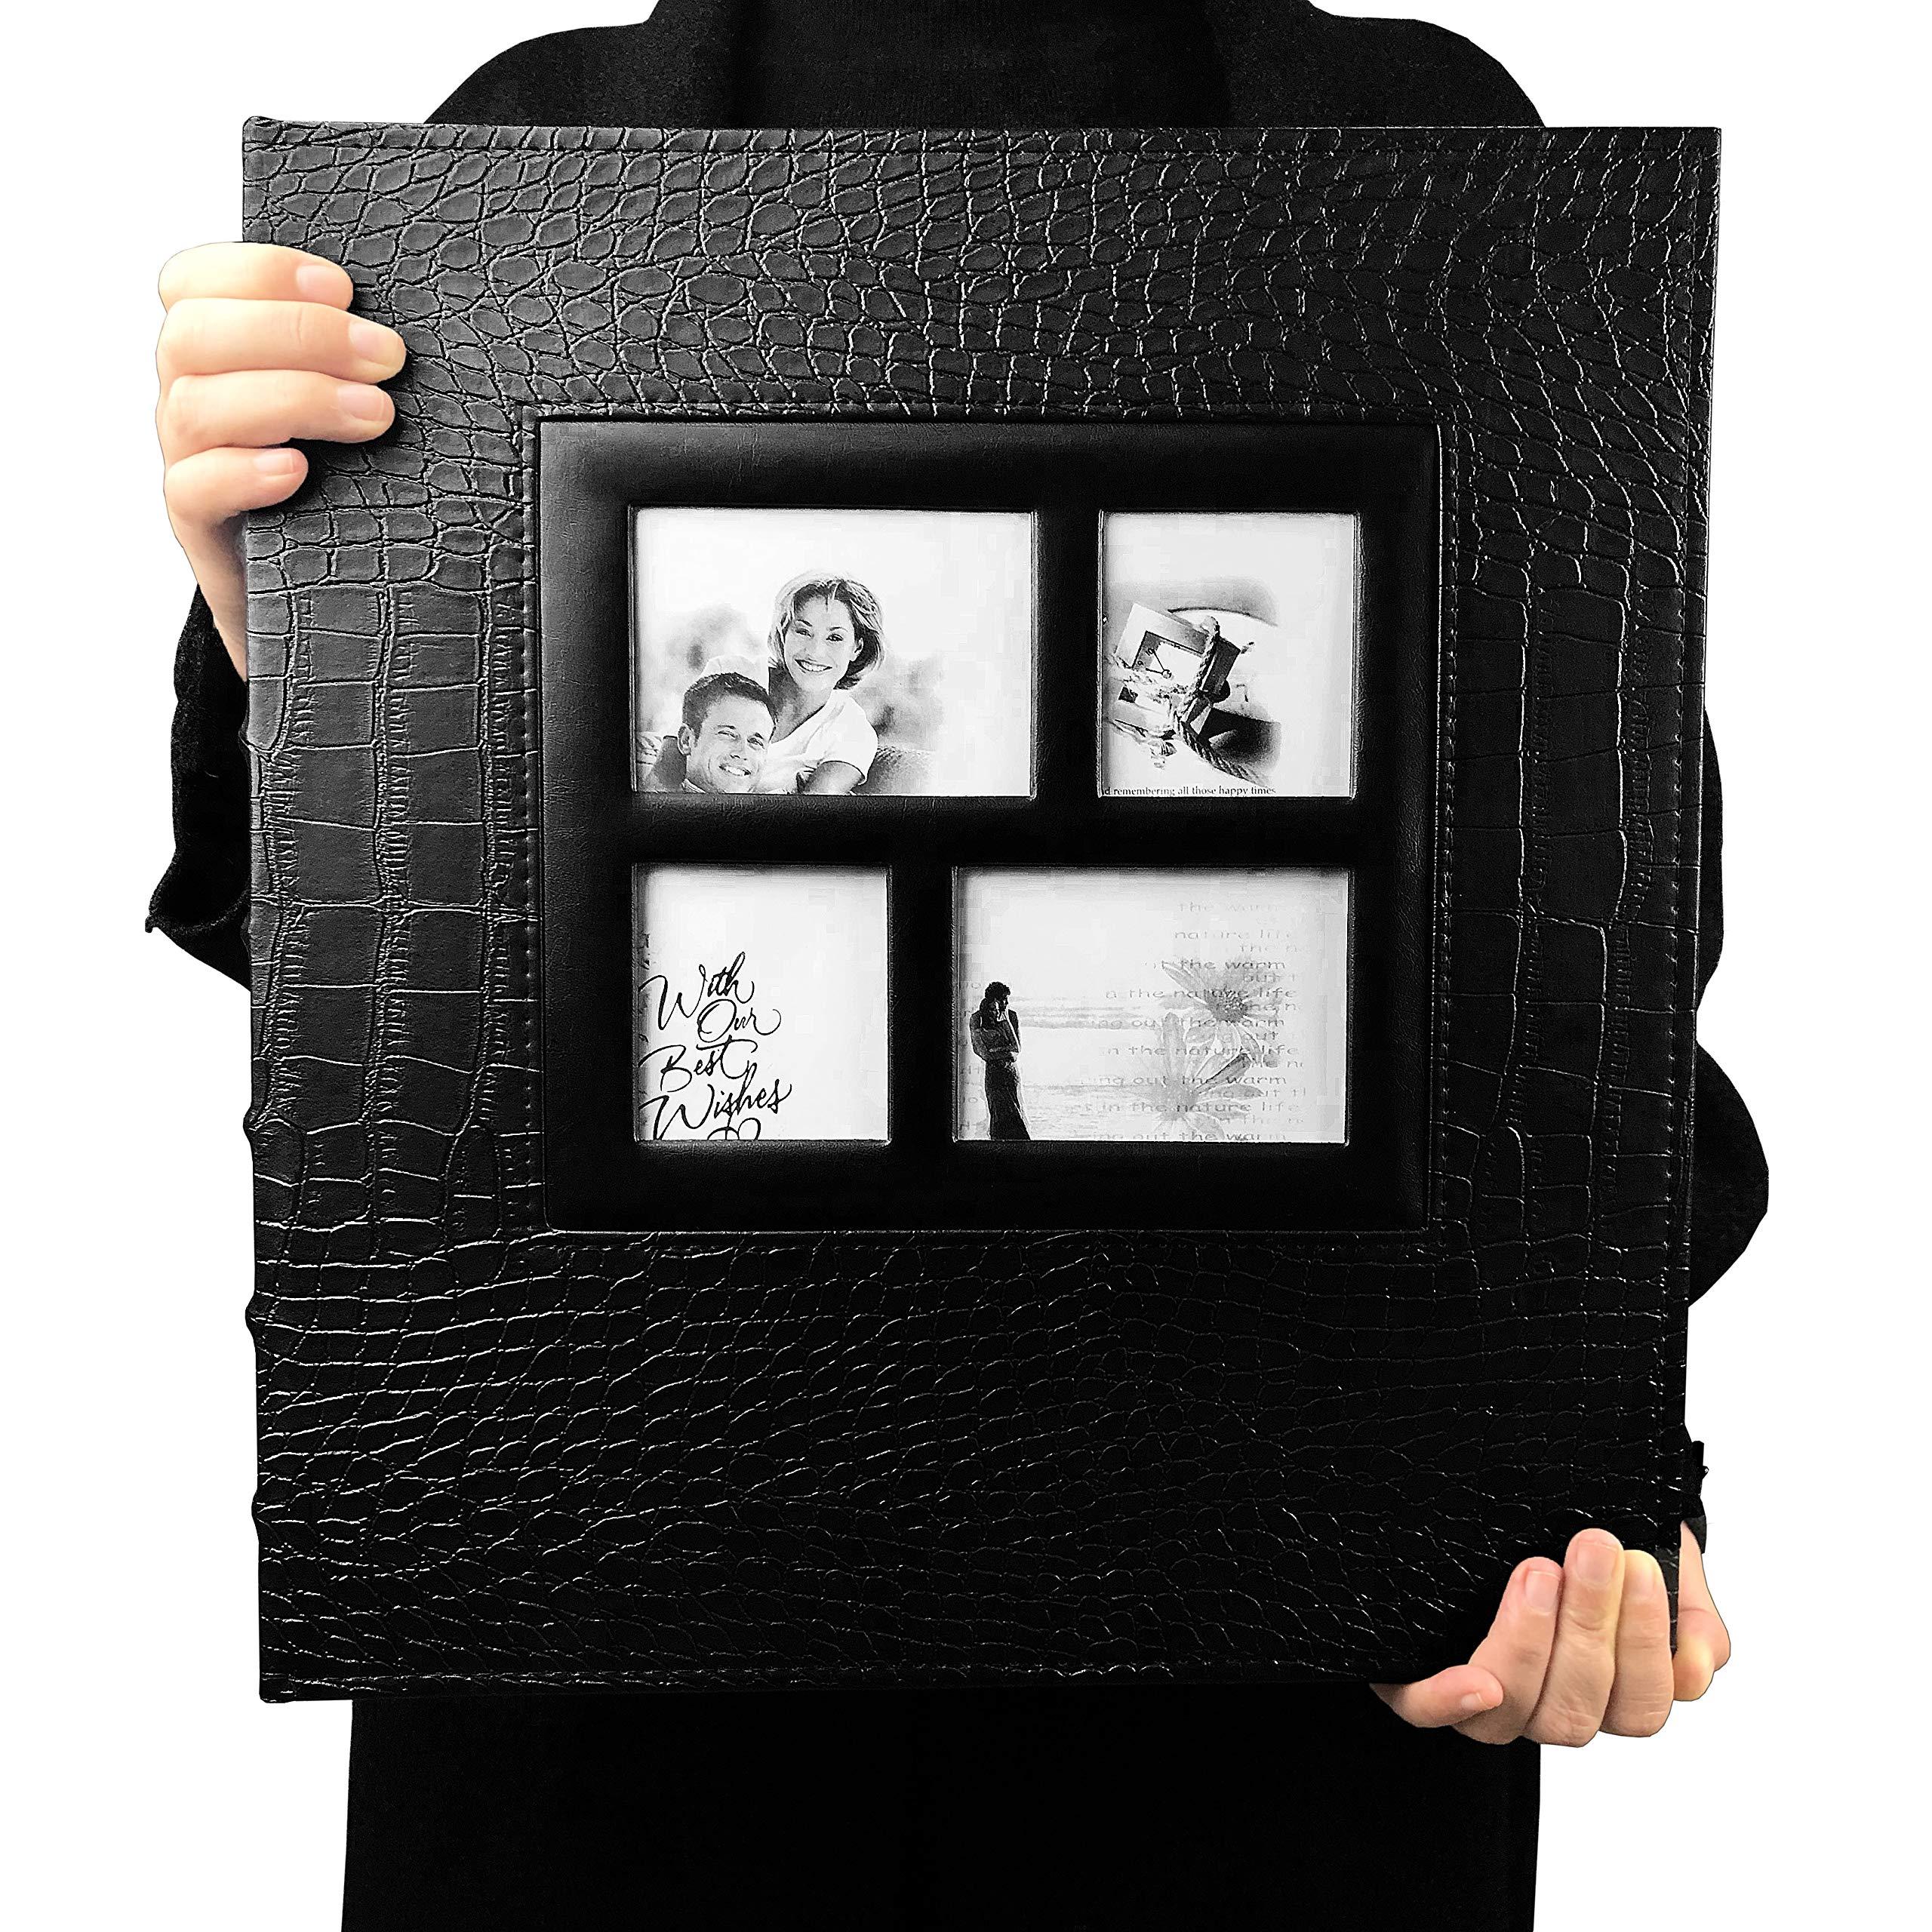 RECUTMS Photo Album 600 Pockets,Sewn Bonded Black Leather Book Pockets Hardcover Photo Frame 4x6 Photos Wedding Gift Valentines Day Present